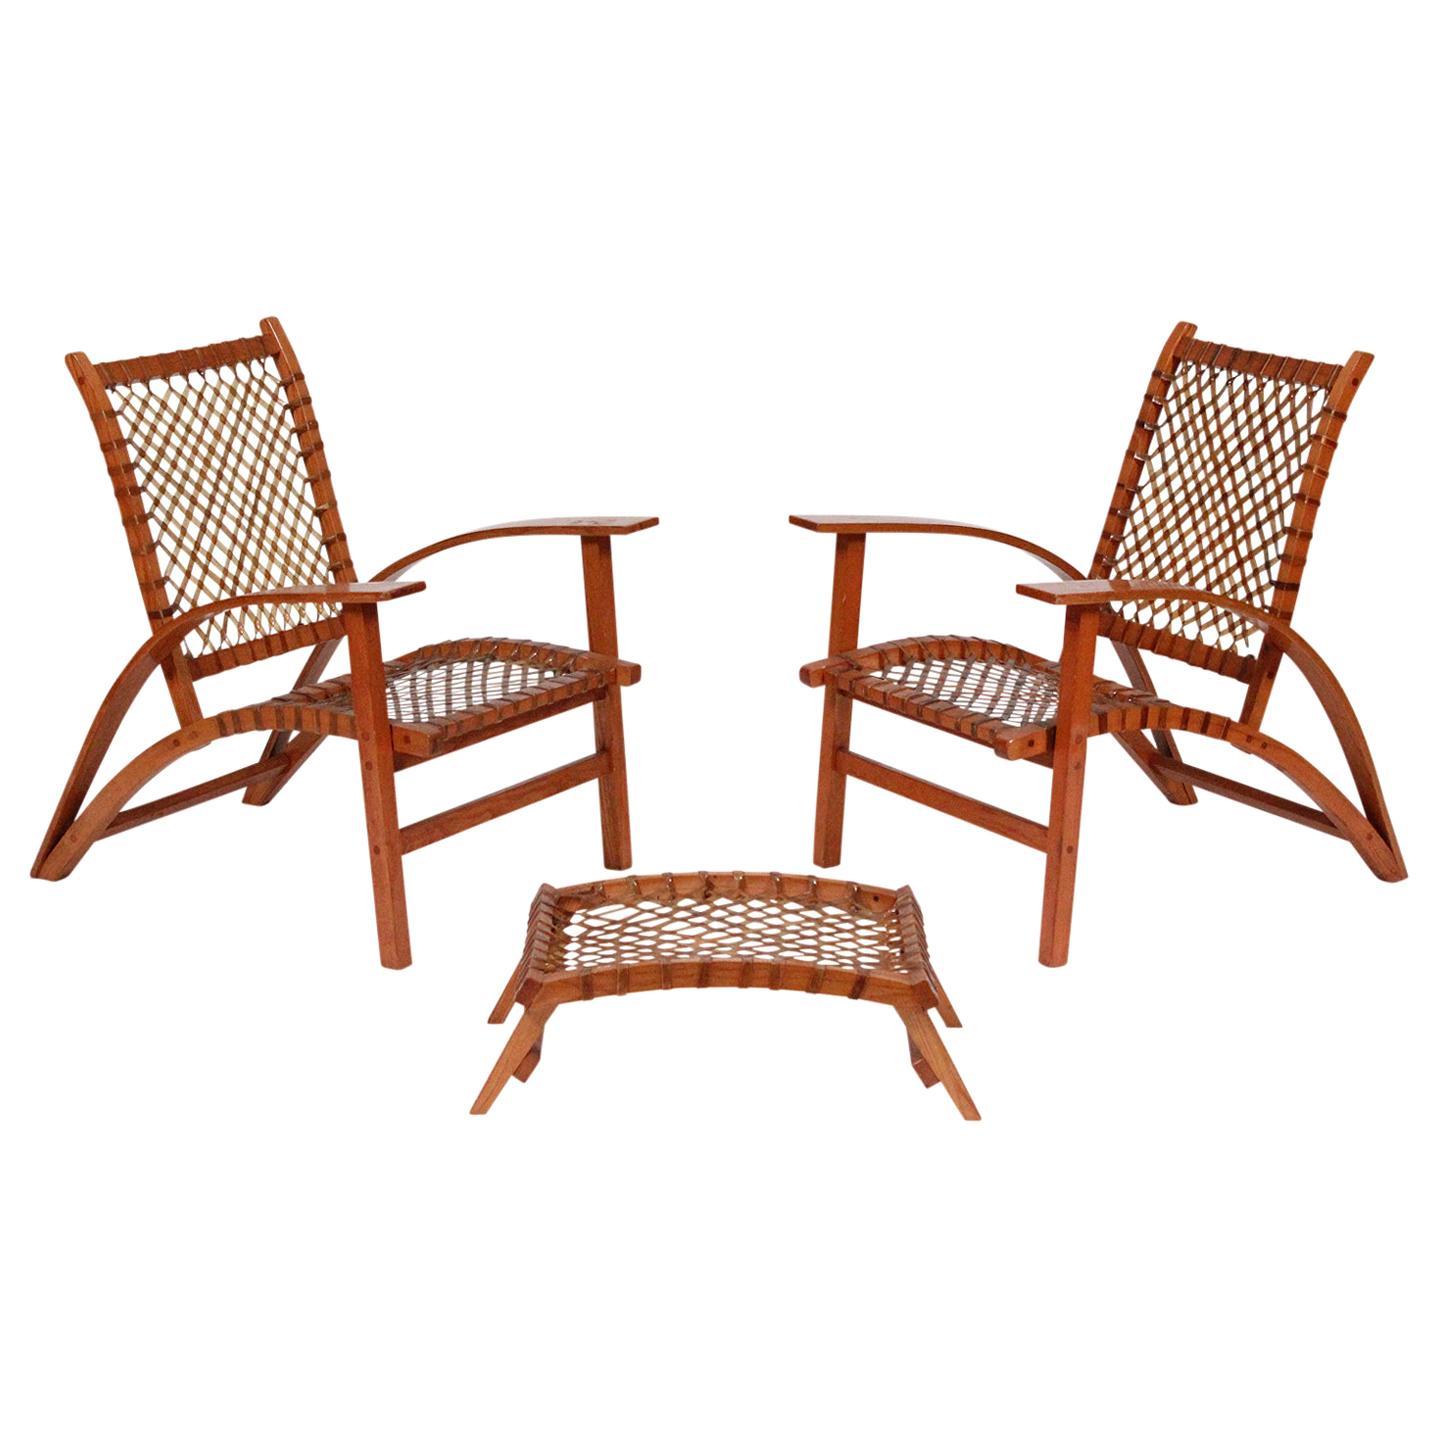 "Carl Koch for Tubbs ""Sno Shu"" Lounge Chairs and Ottoman"